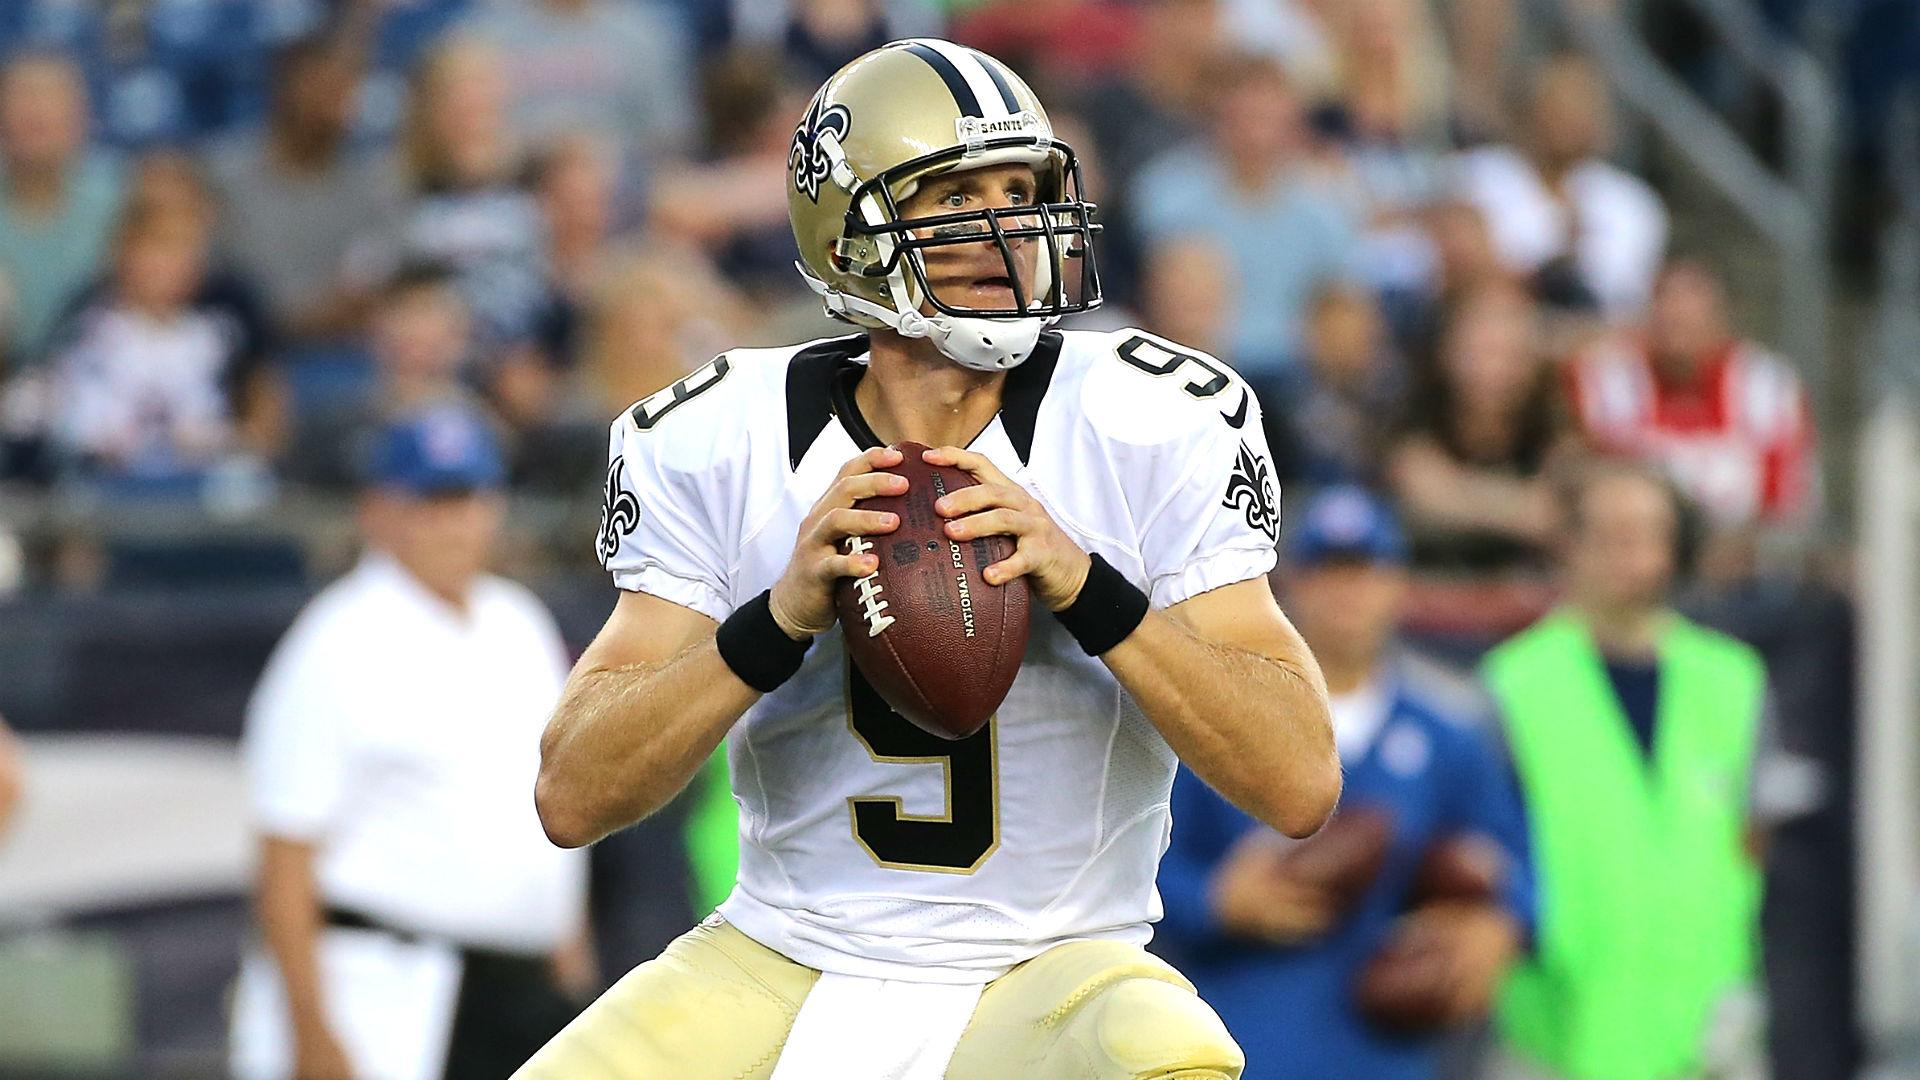 Week 10 NFL picks against spread: Saints stump Bills; Falcons cool Cowboys